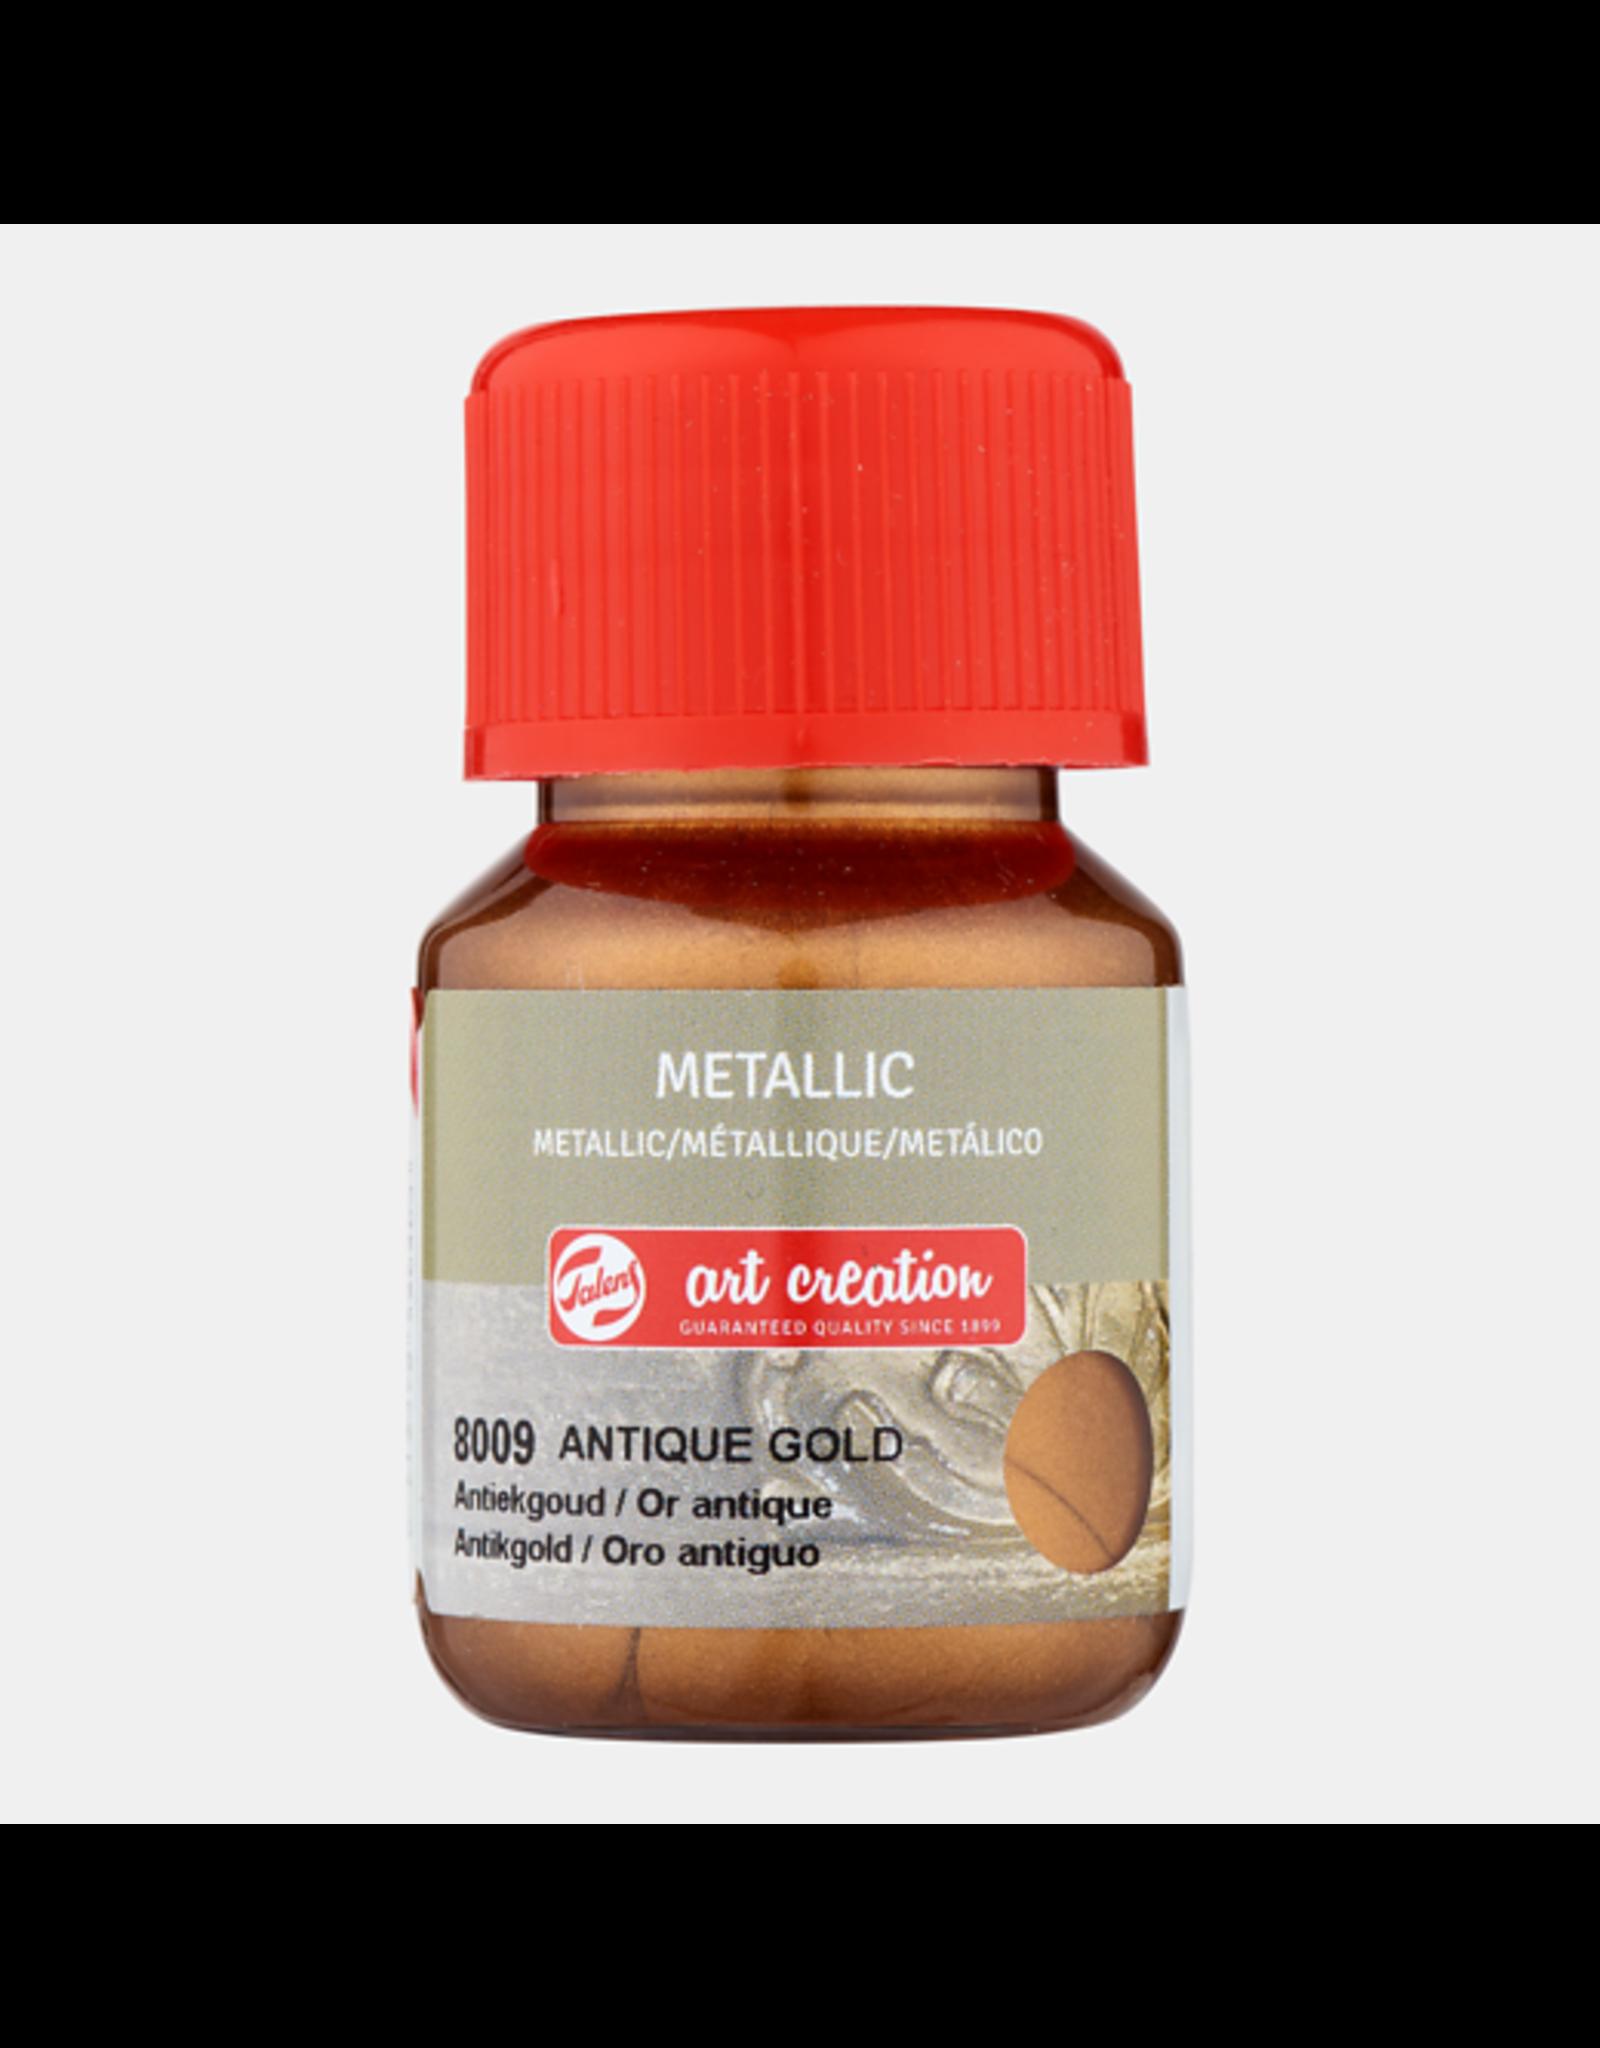 Art creation Antiekgoud - Metallic - 30 ml